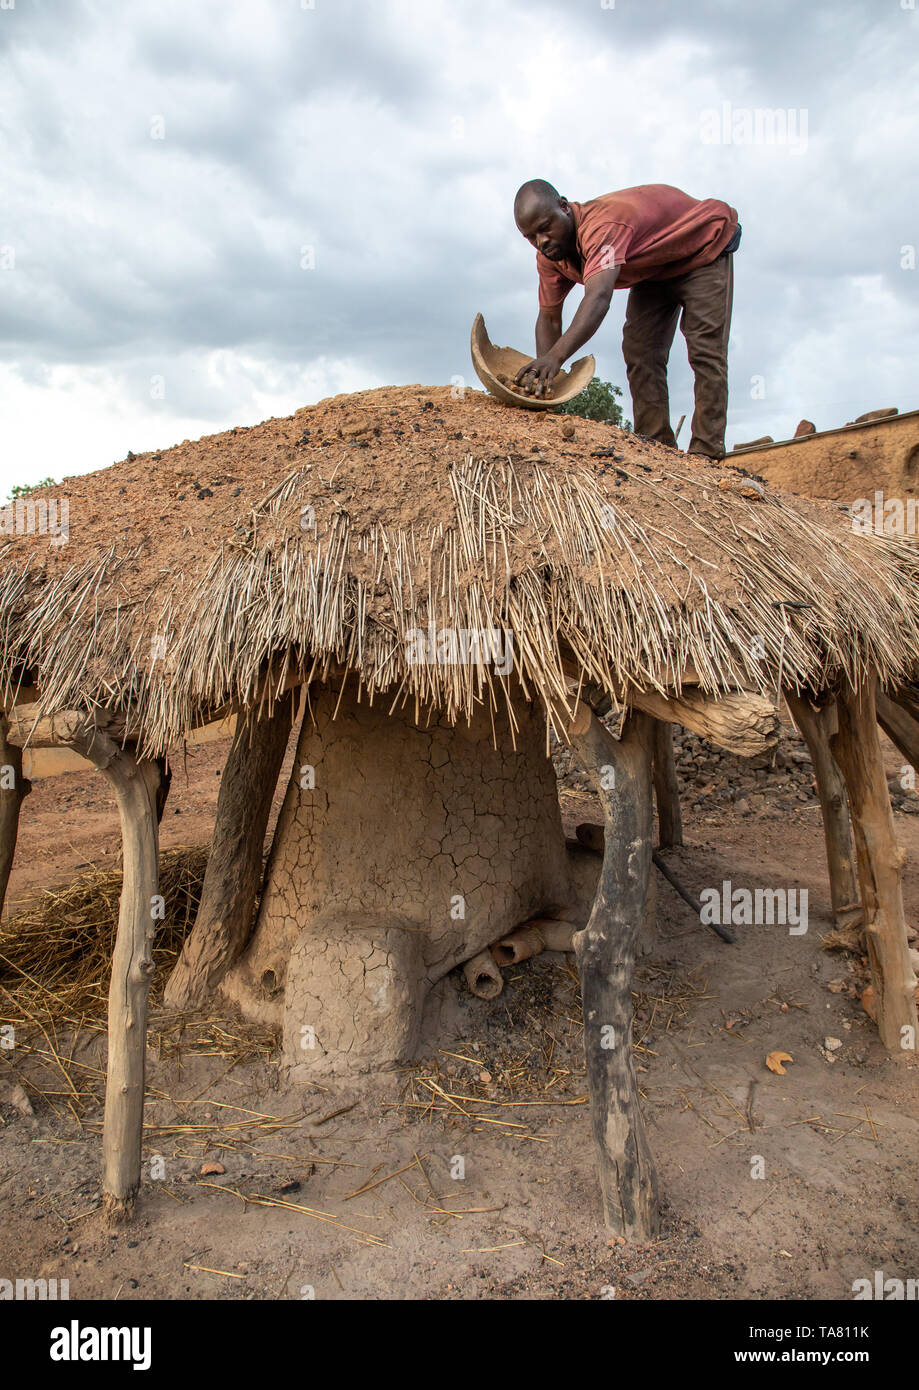 Senufo blacksmith putting charcoal from the top of the house, Poro region, Koni, Ivory Coast Stock Photo